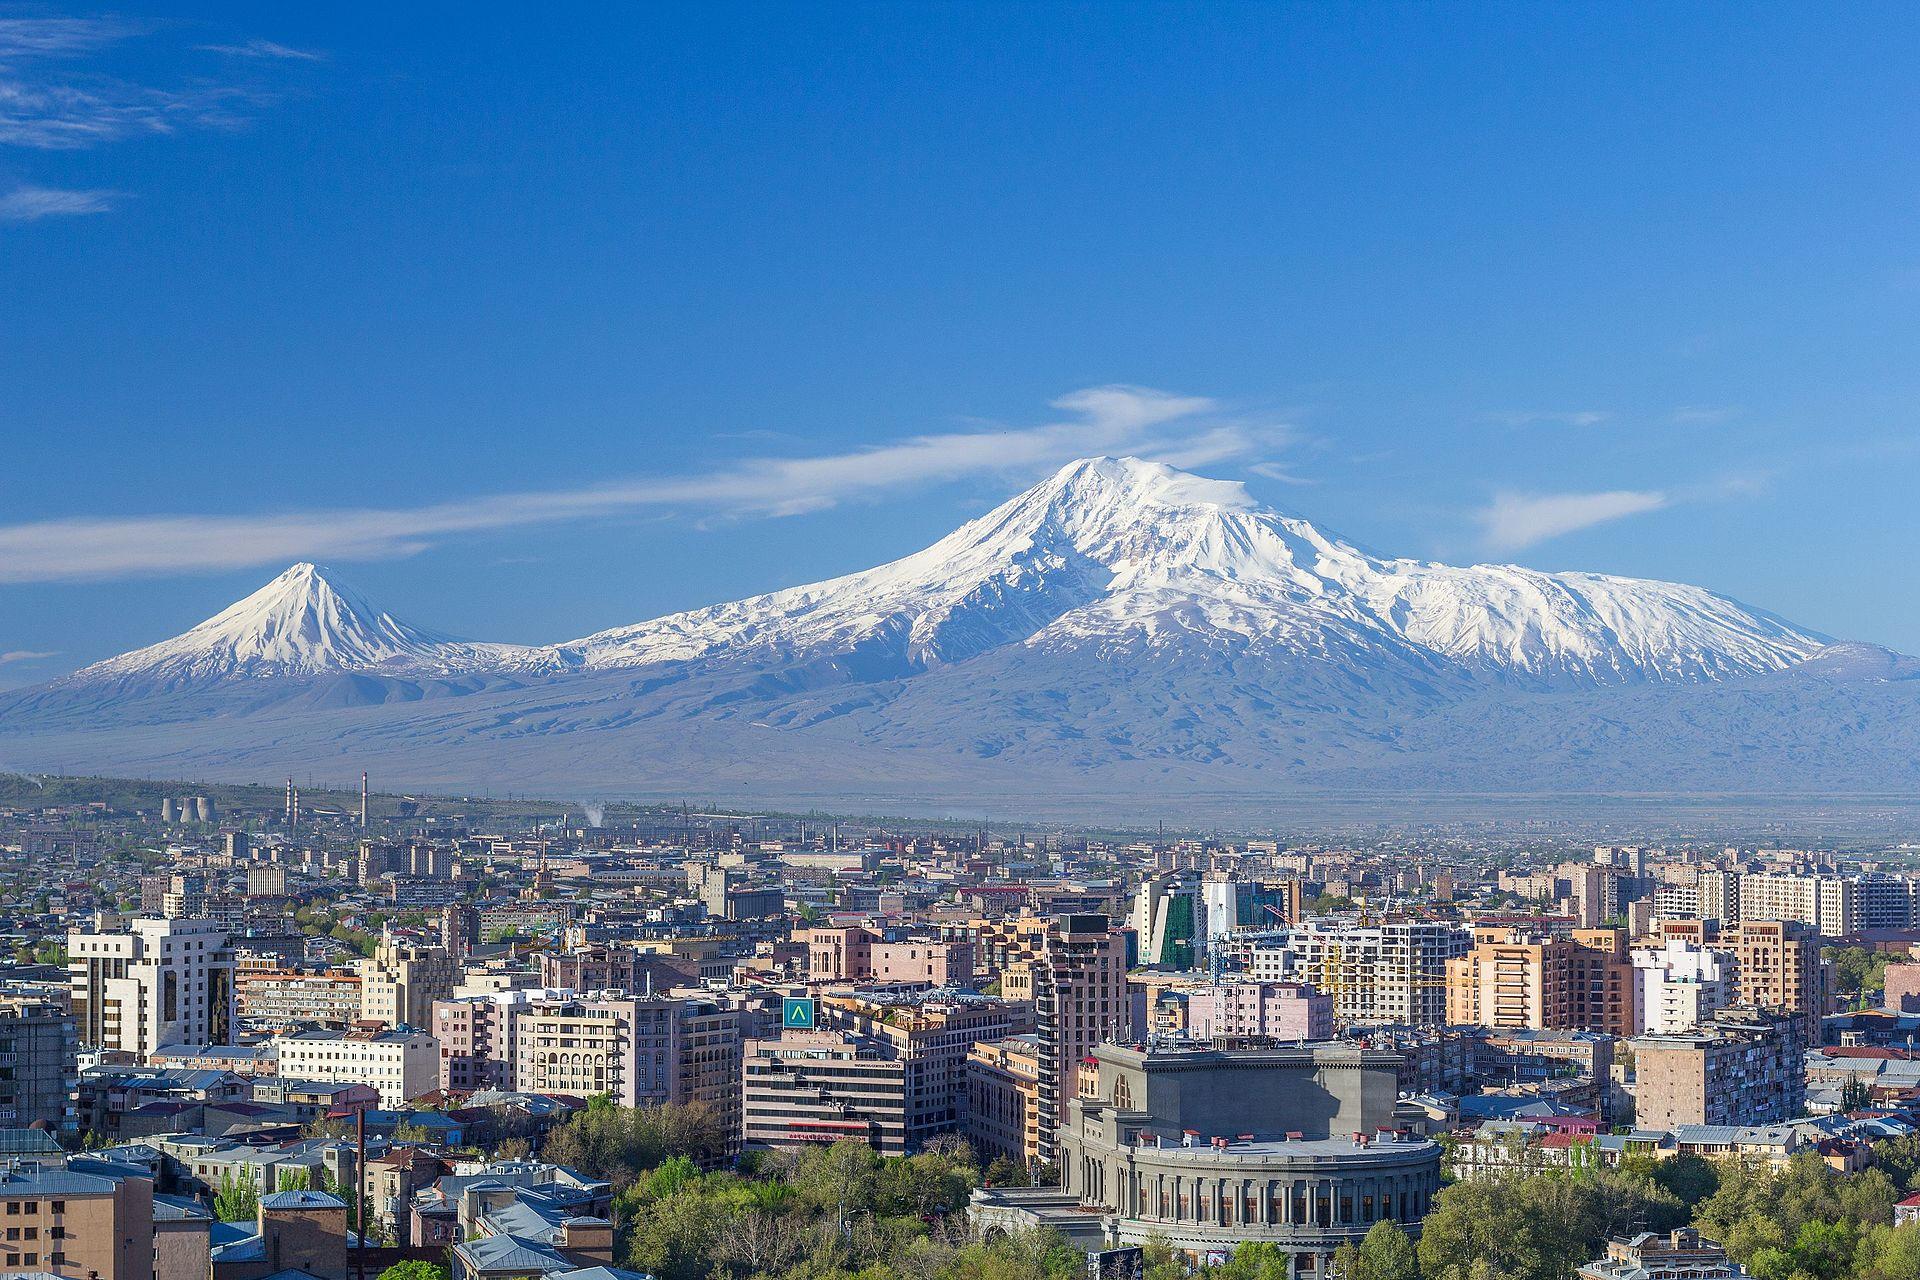 armenia - photo #48